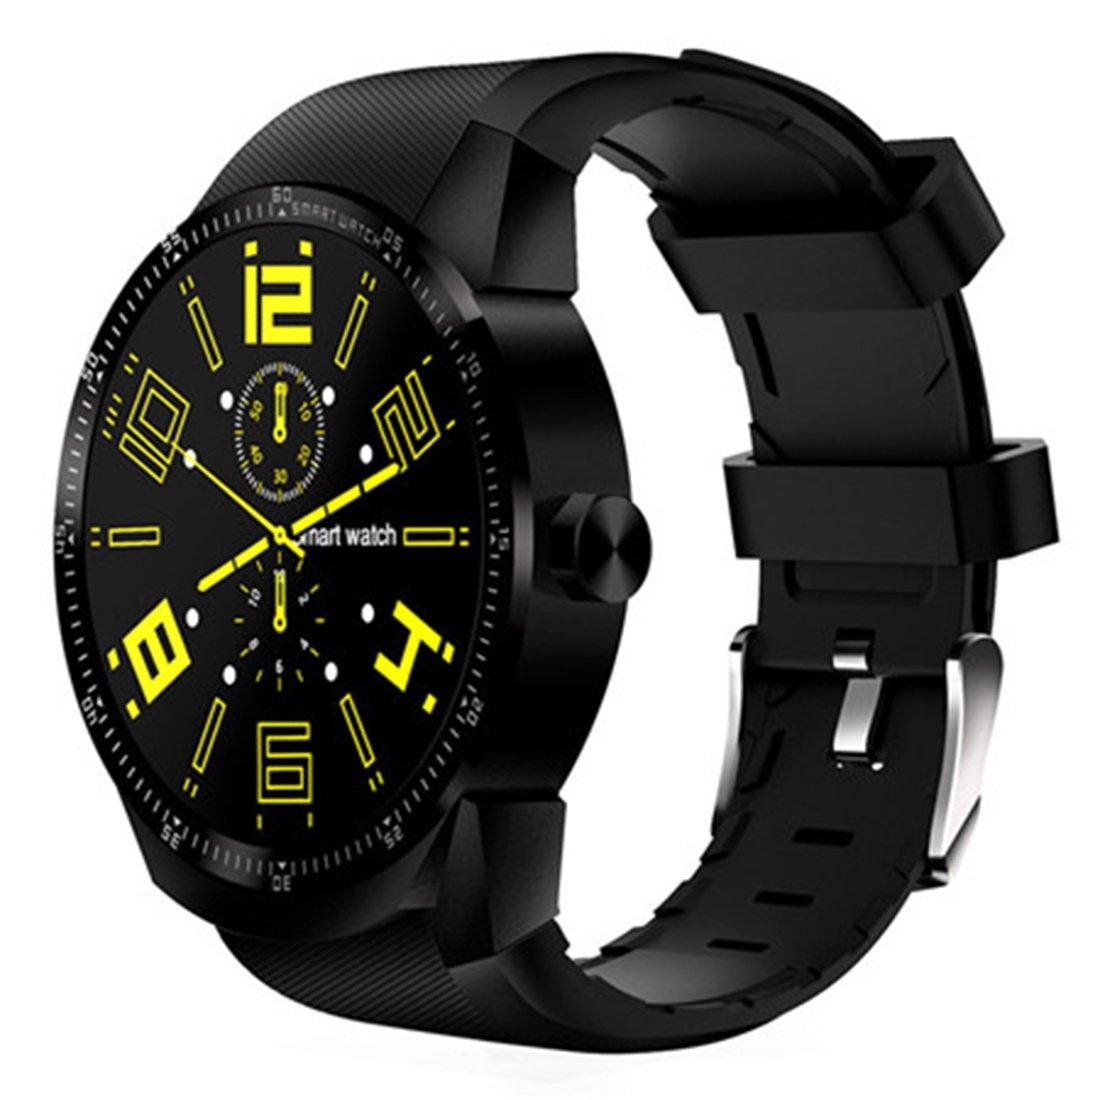 Amazon.com: PINCHU K98H 3G Smart Watch Phone GPS Navigation ...